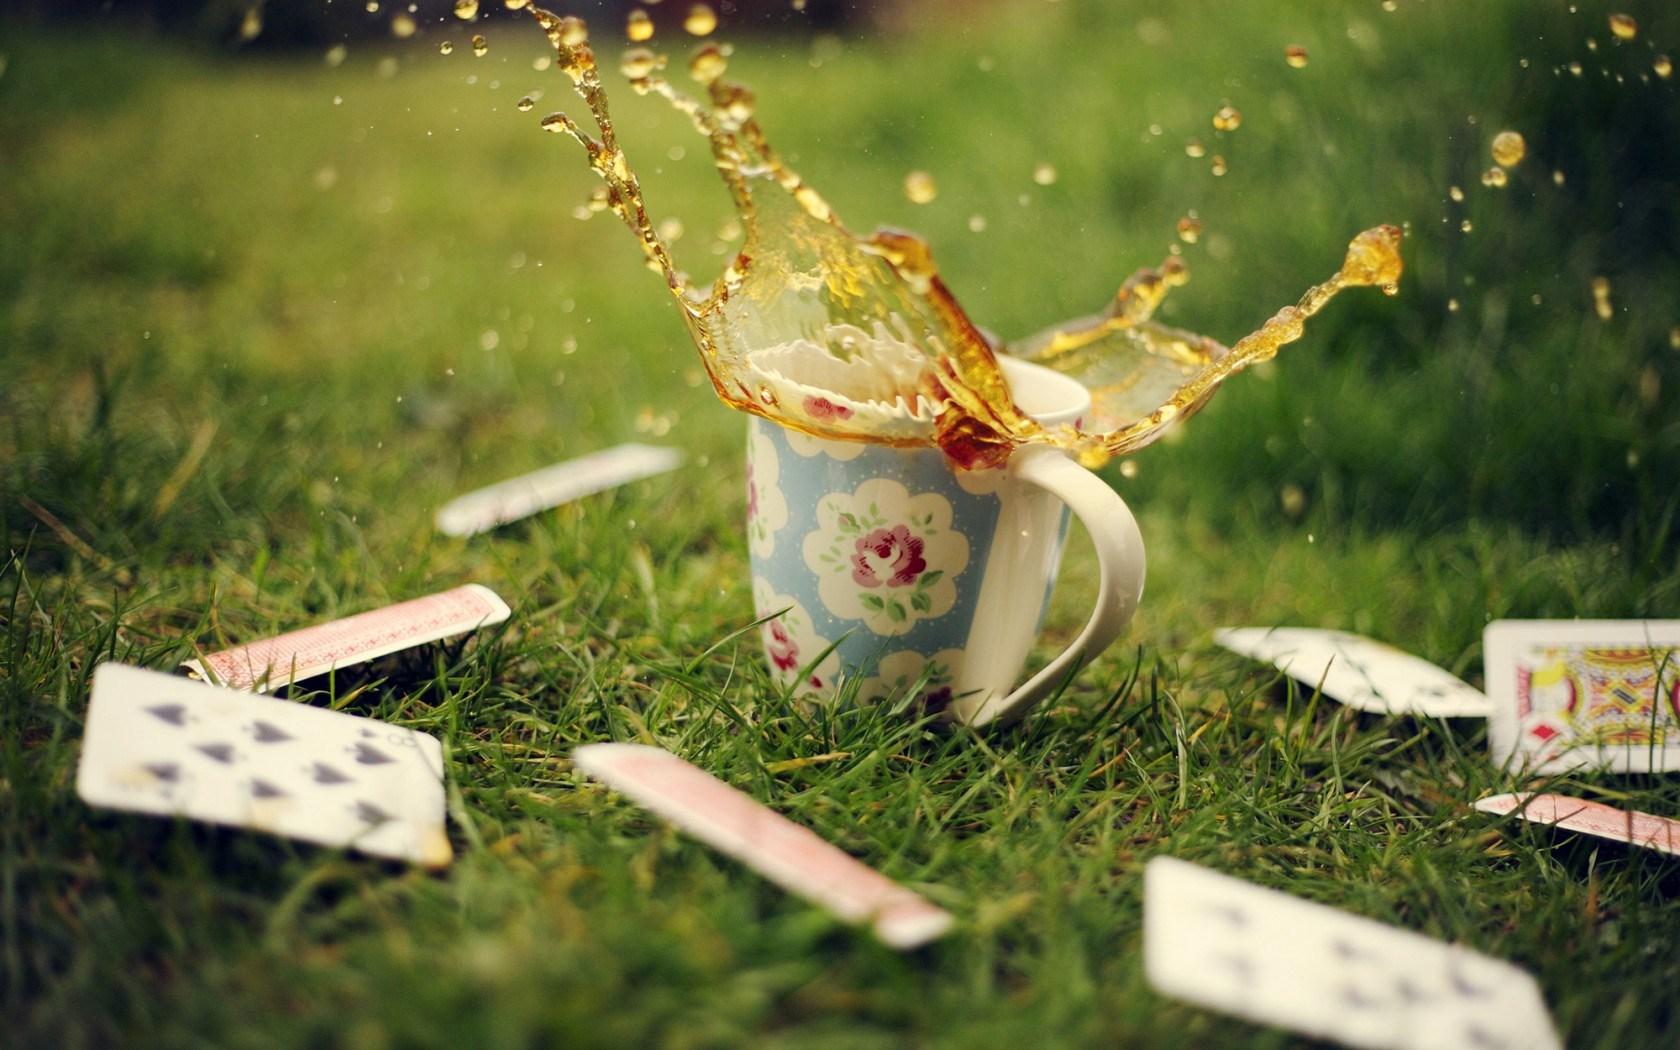 Cup Mug Tea Spray Splash Drops